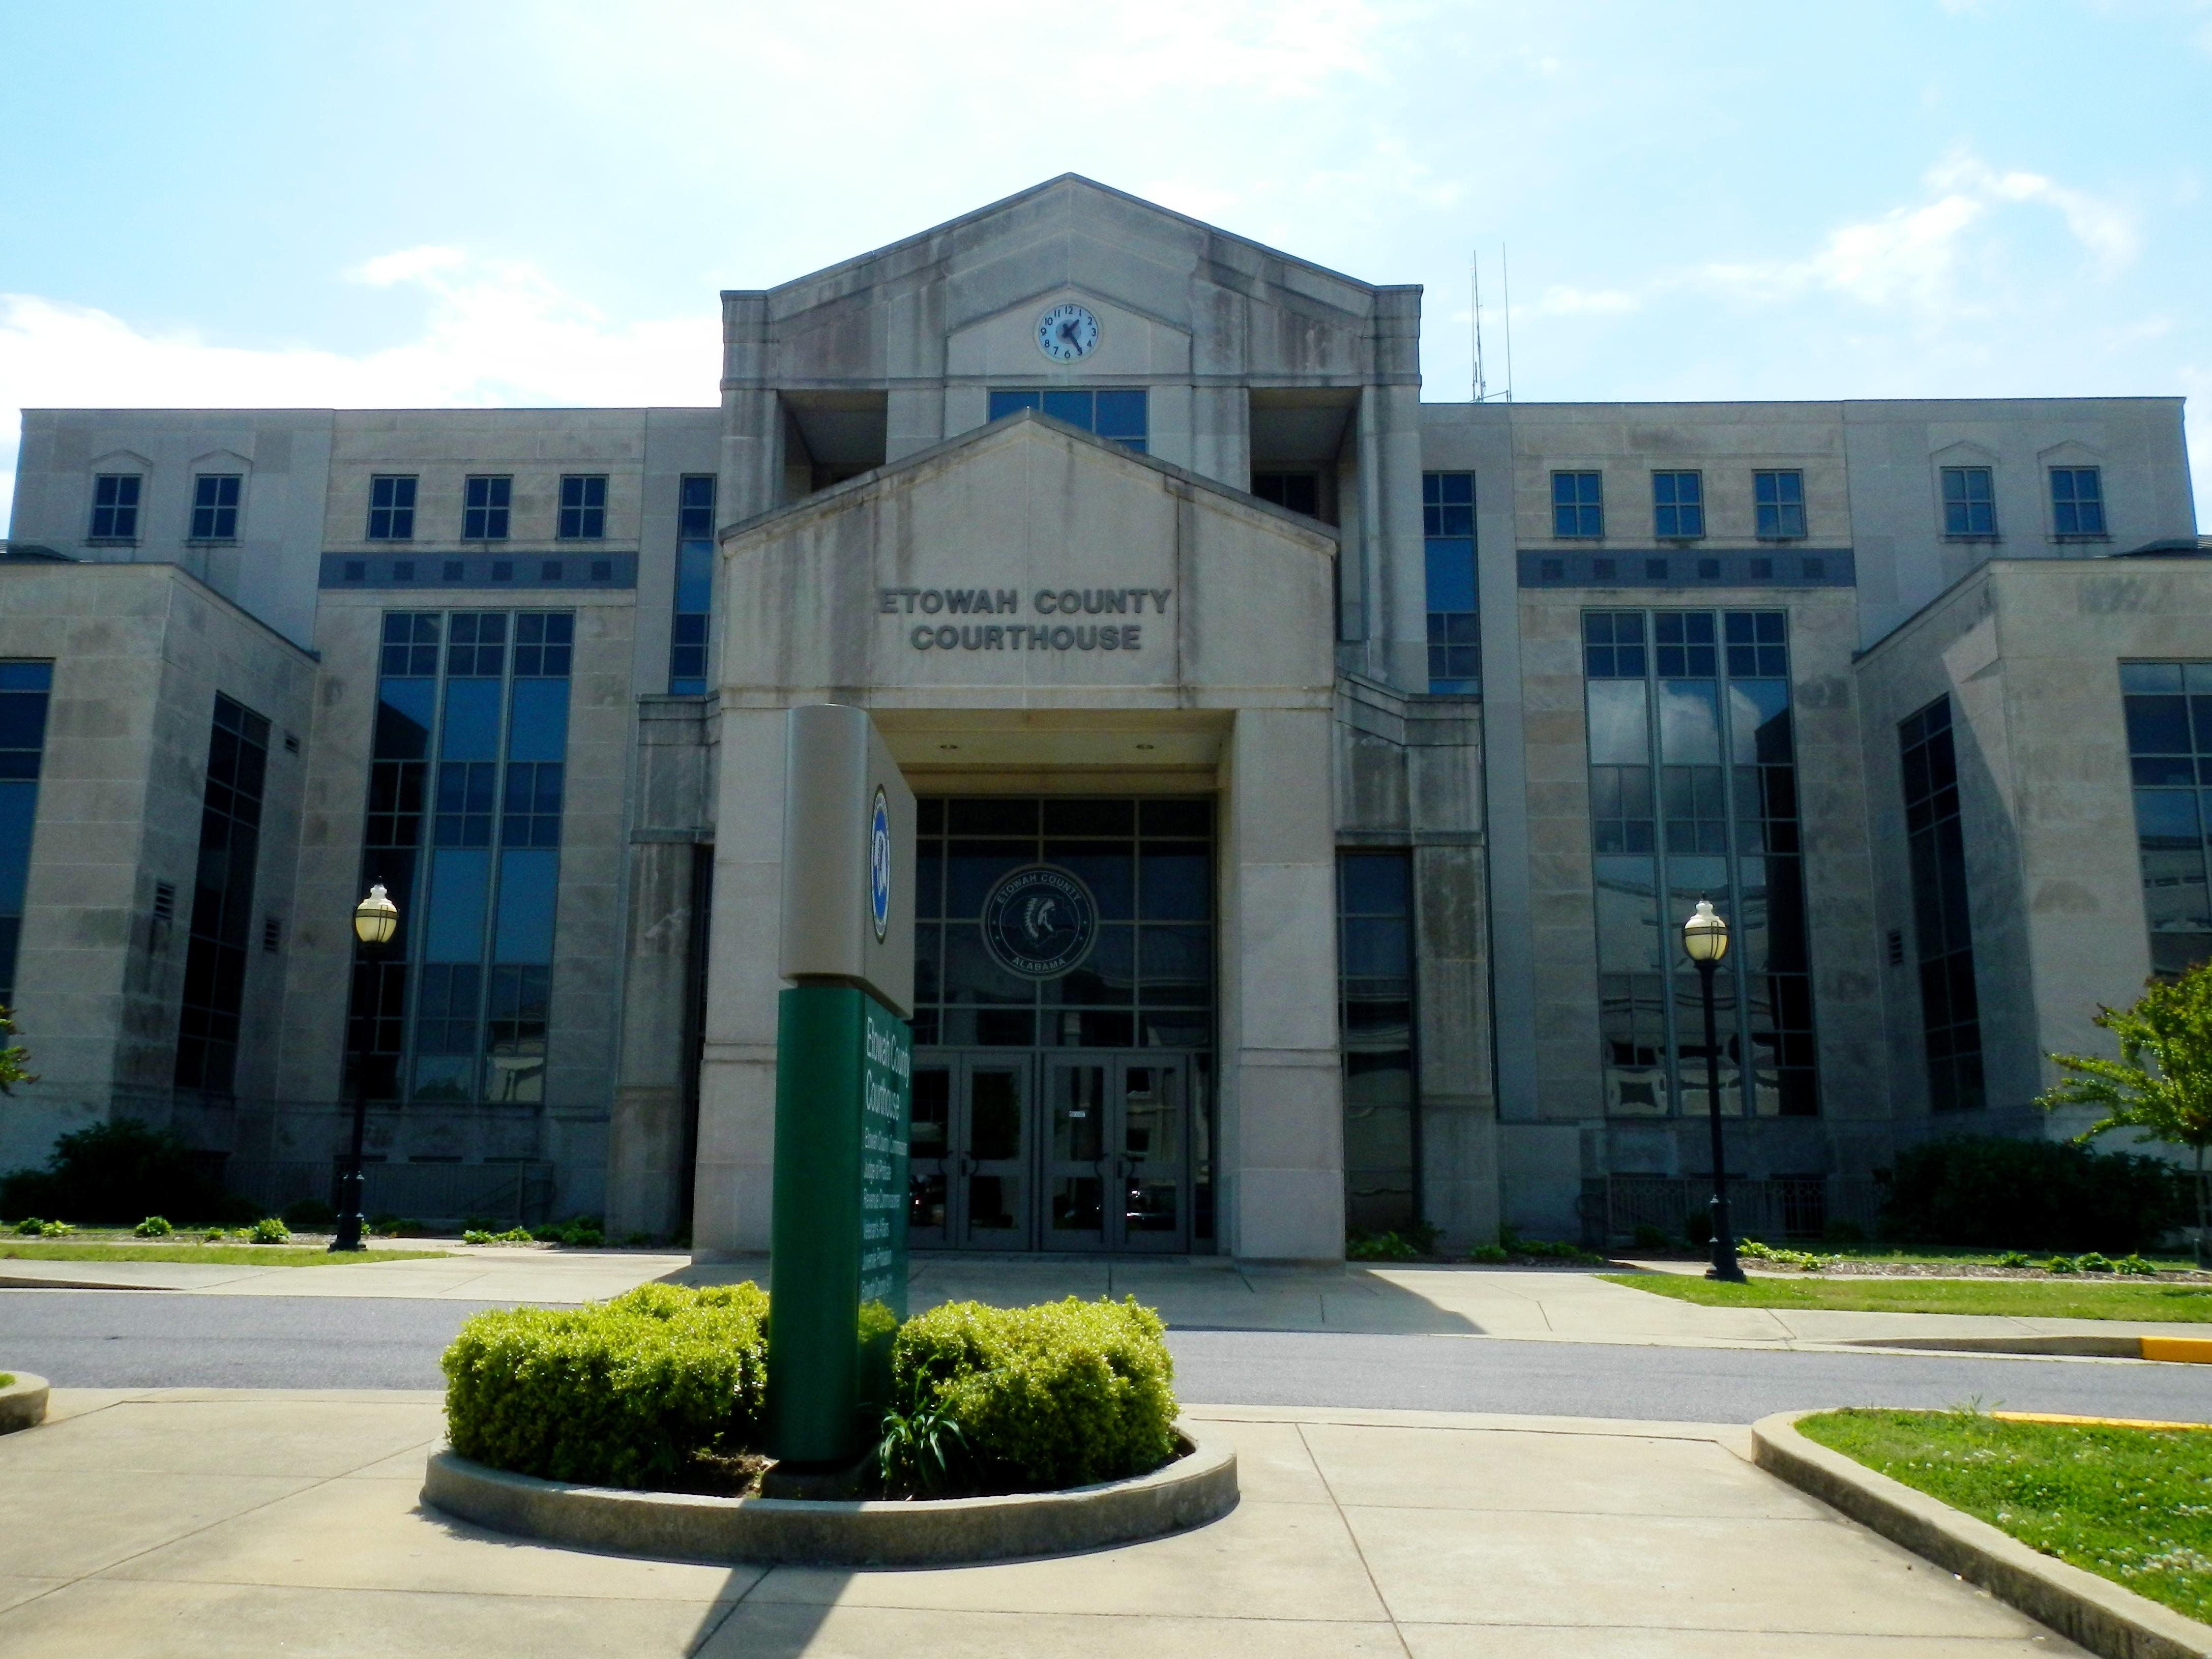 File:Etowah County, Alabama Courthouse.JPGbalance of etowah county